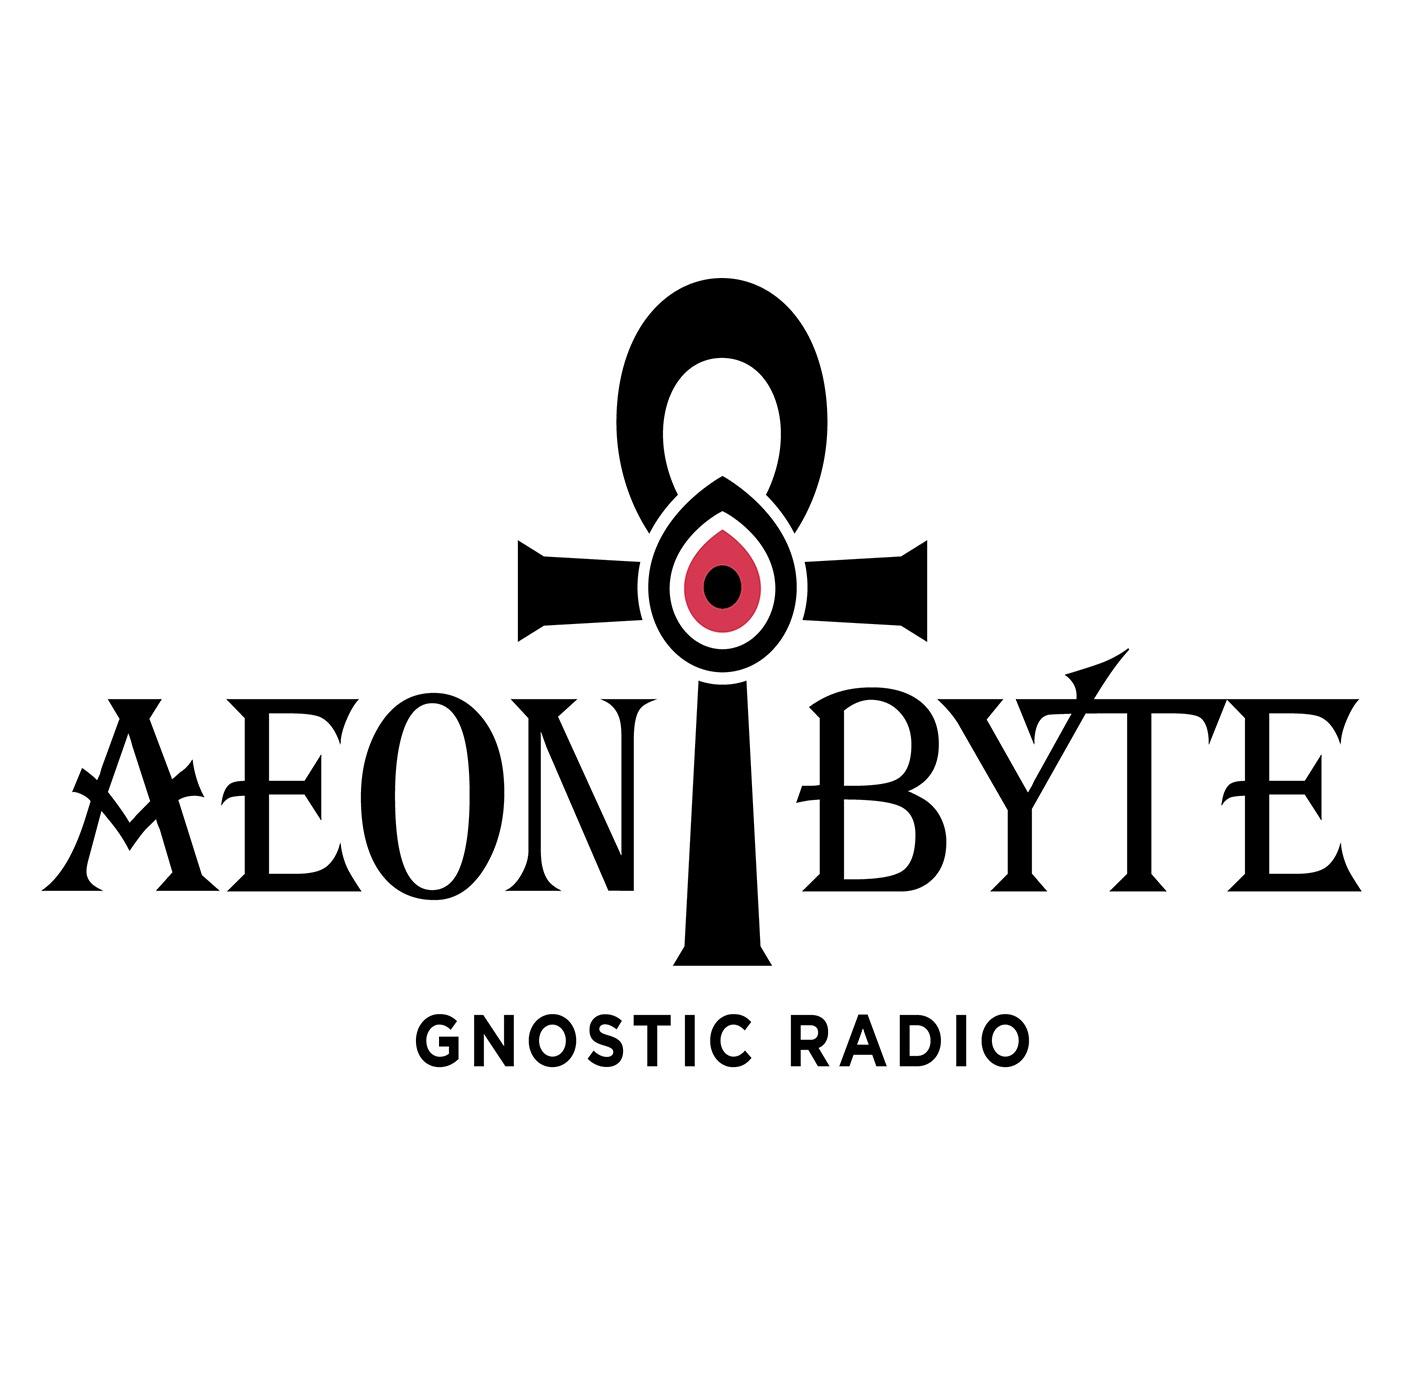 Aeon Byte Gnostic Radio show art